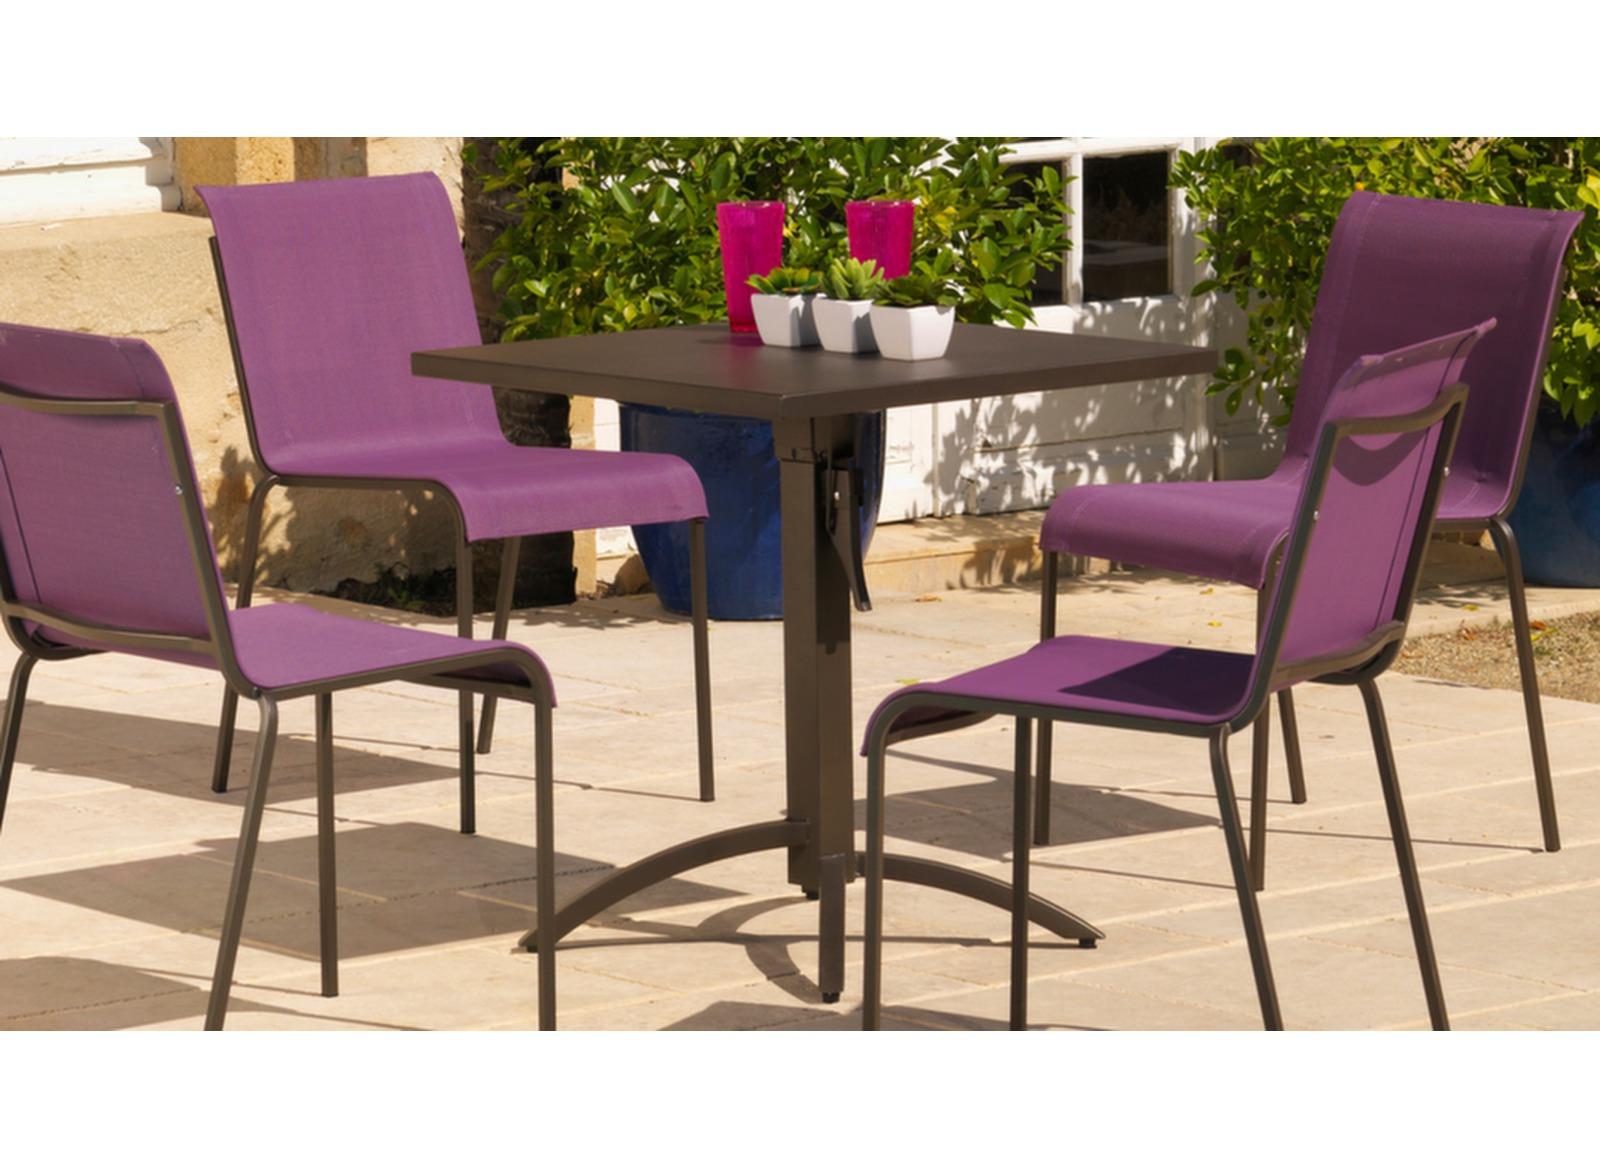 promotion gu ridon de jardin bas new orleans oc o. Black Bedroom Furniture Sets. Home Design Ideas